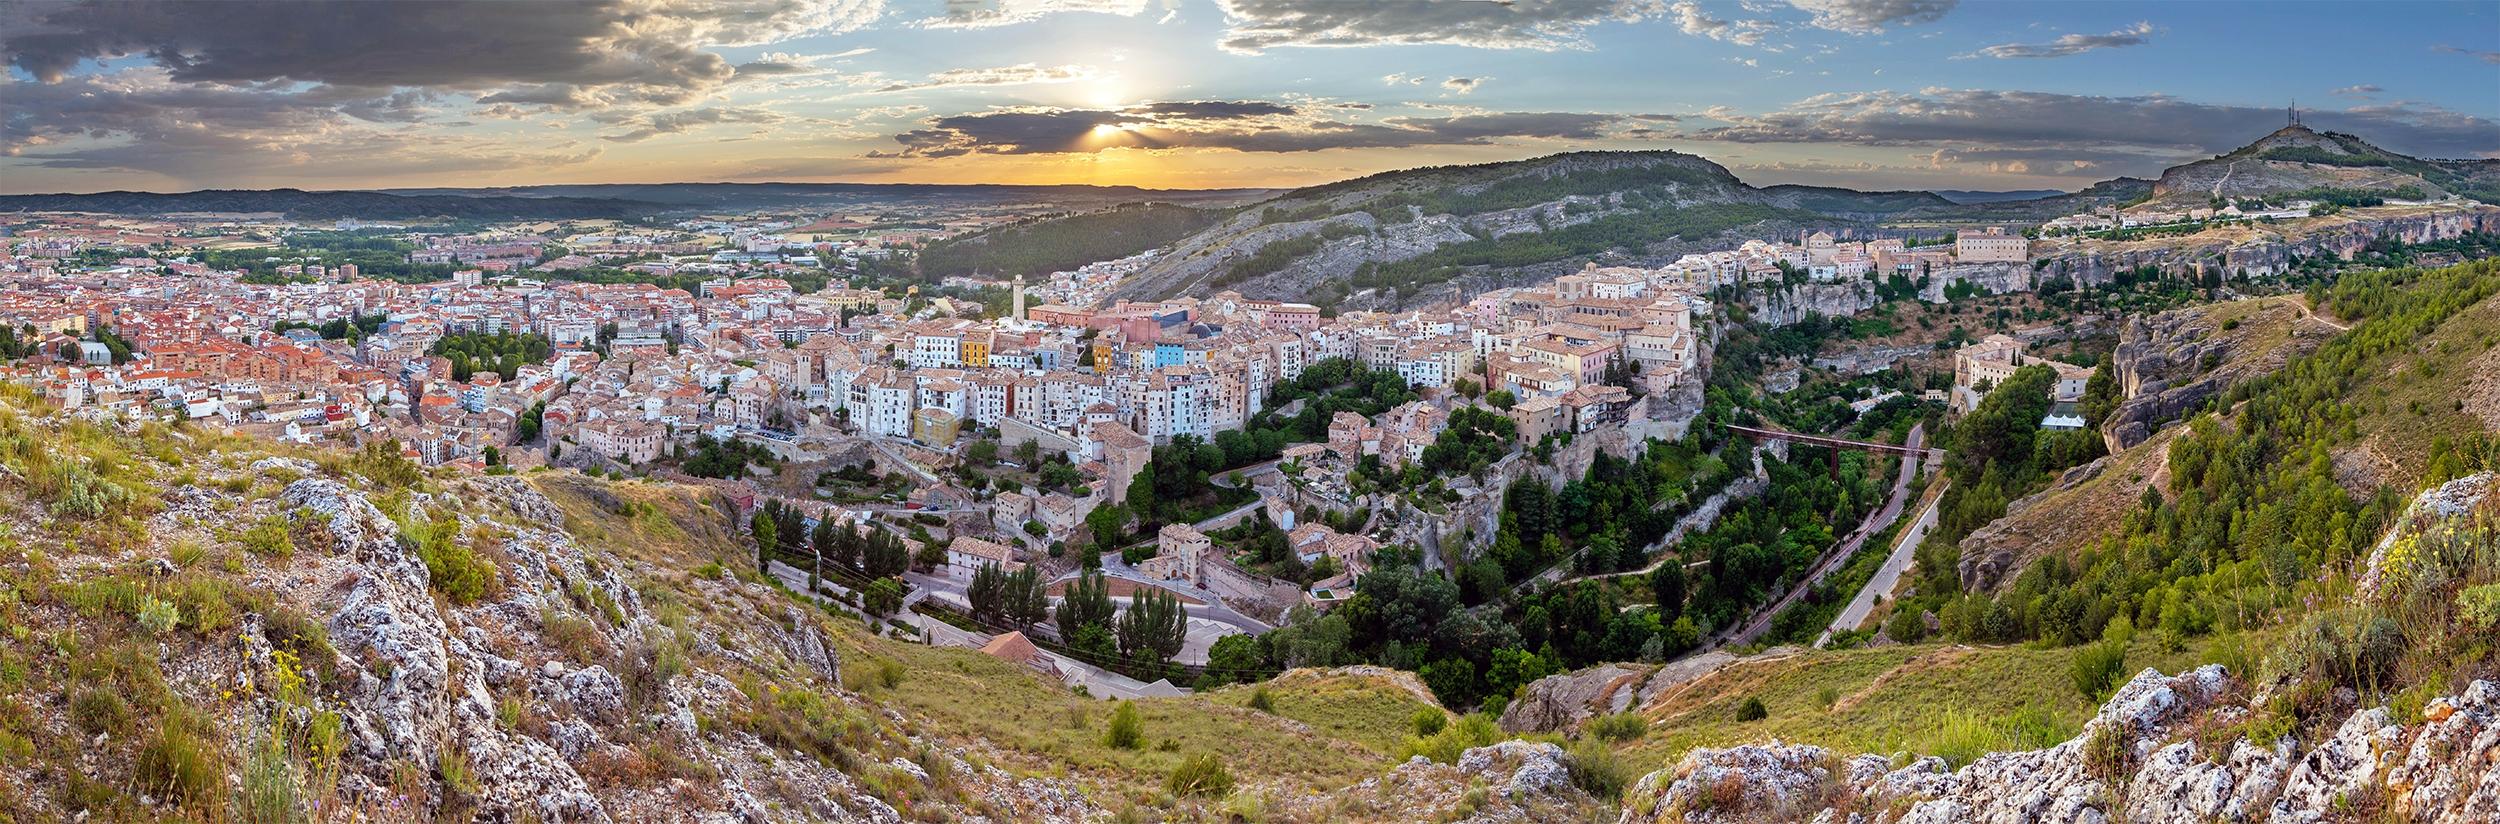 Cuenca CLM 2020